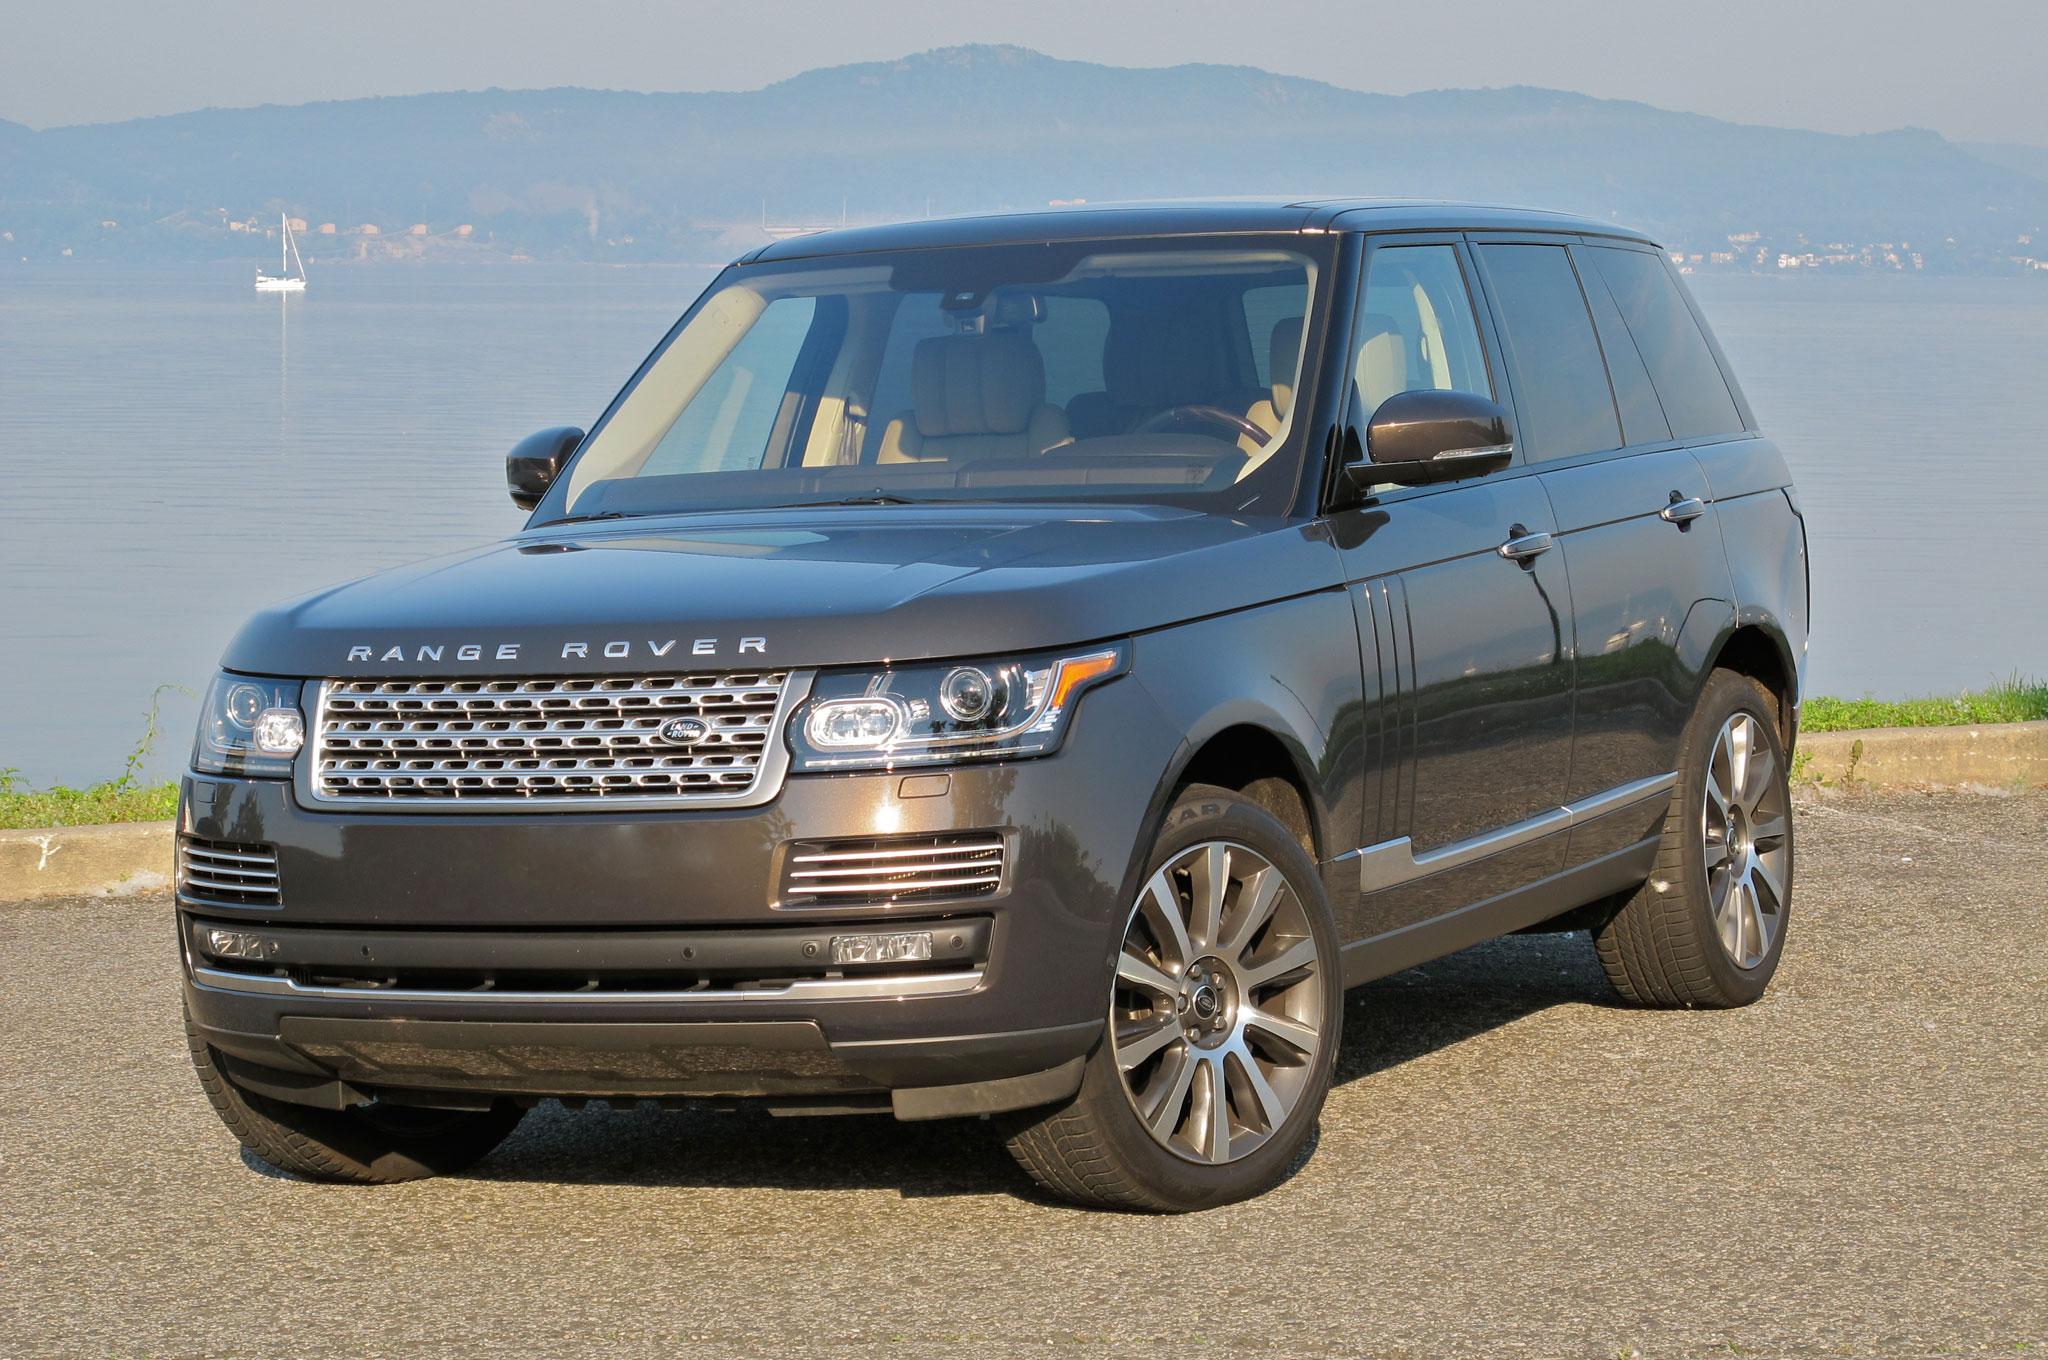 weekend roundup 2013 range rover camaro 1le vs mustang. Black Bedroom Furniture Sets. Home Design Ideas